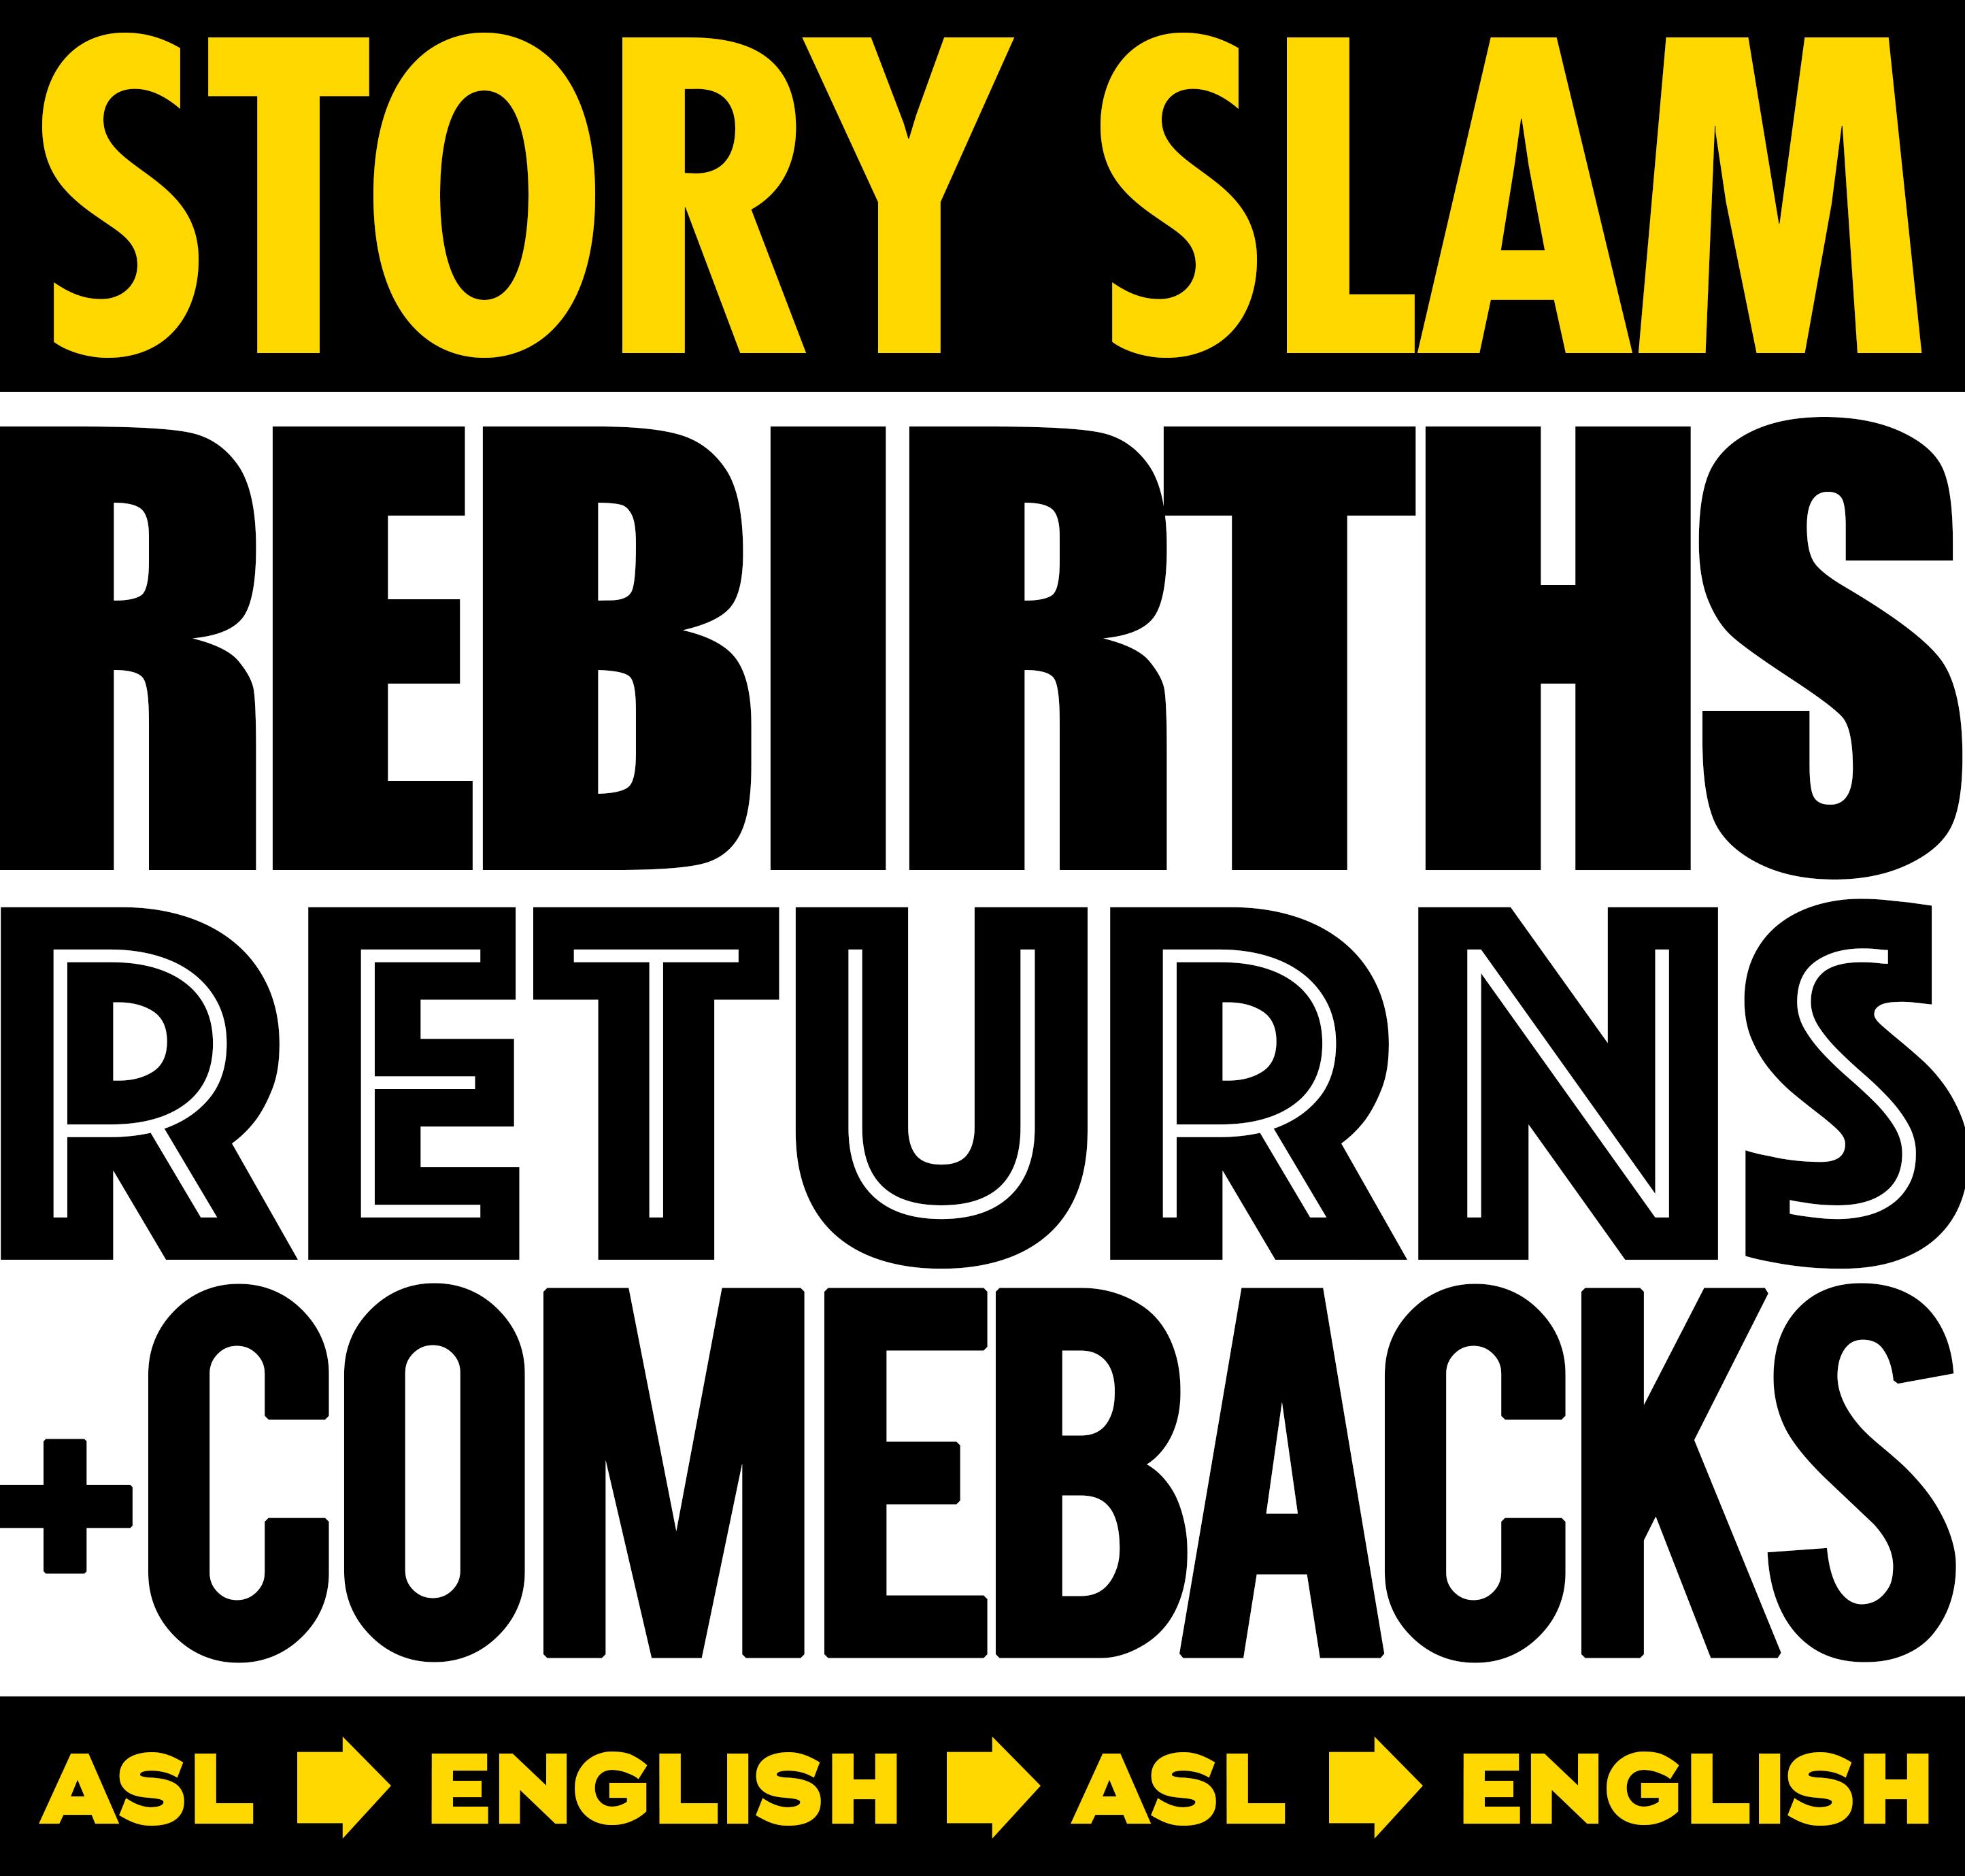 Poster for event Story Slam Rebirths, Returns, and Comebacks